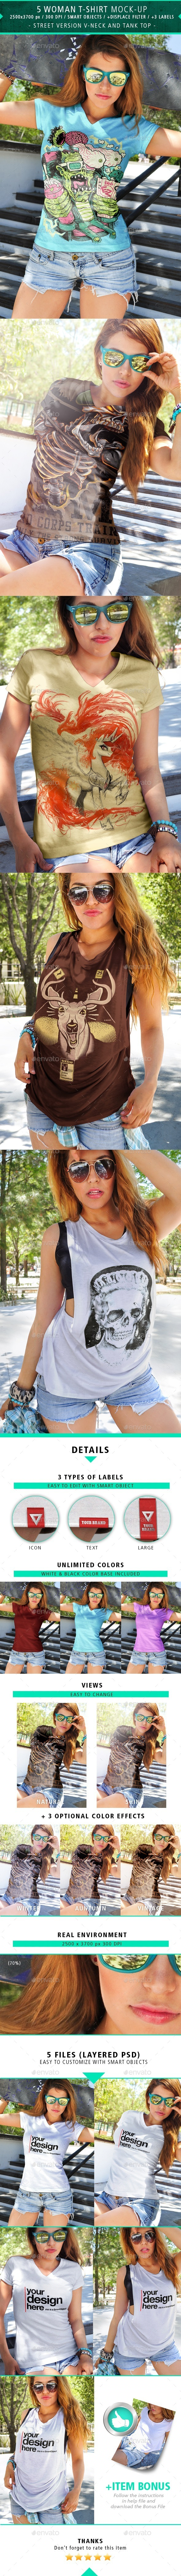 5 Woman T-shirt Mock-up Street Version